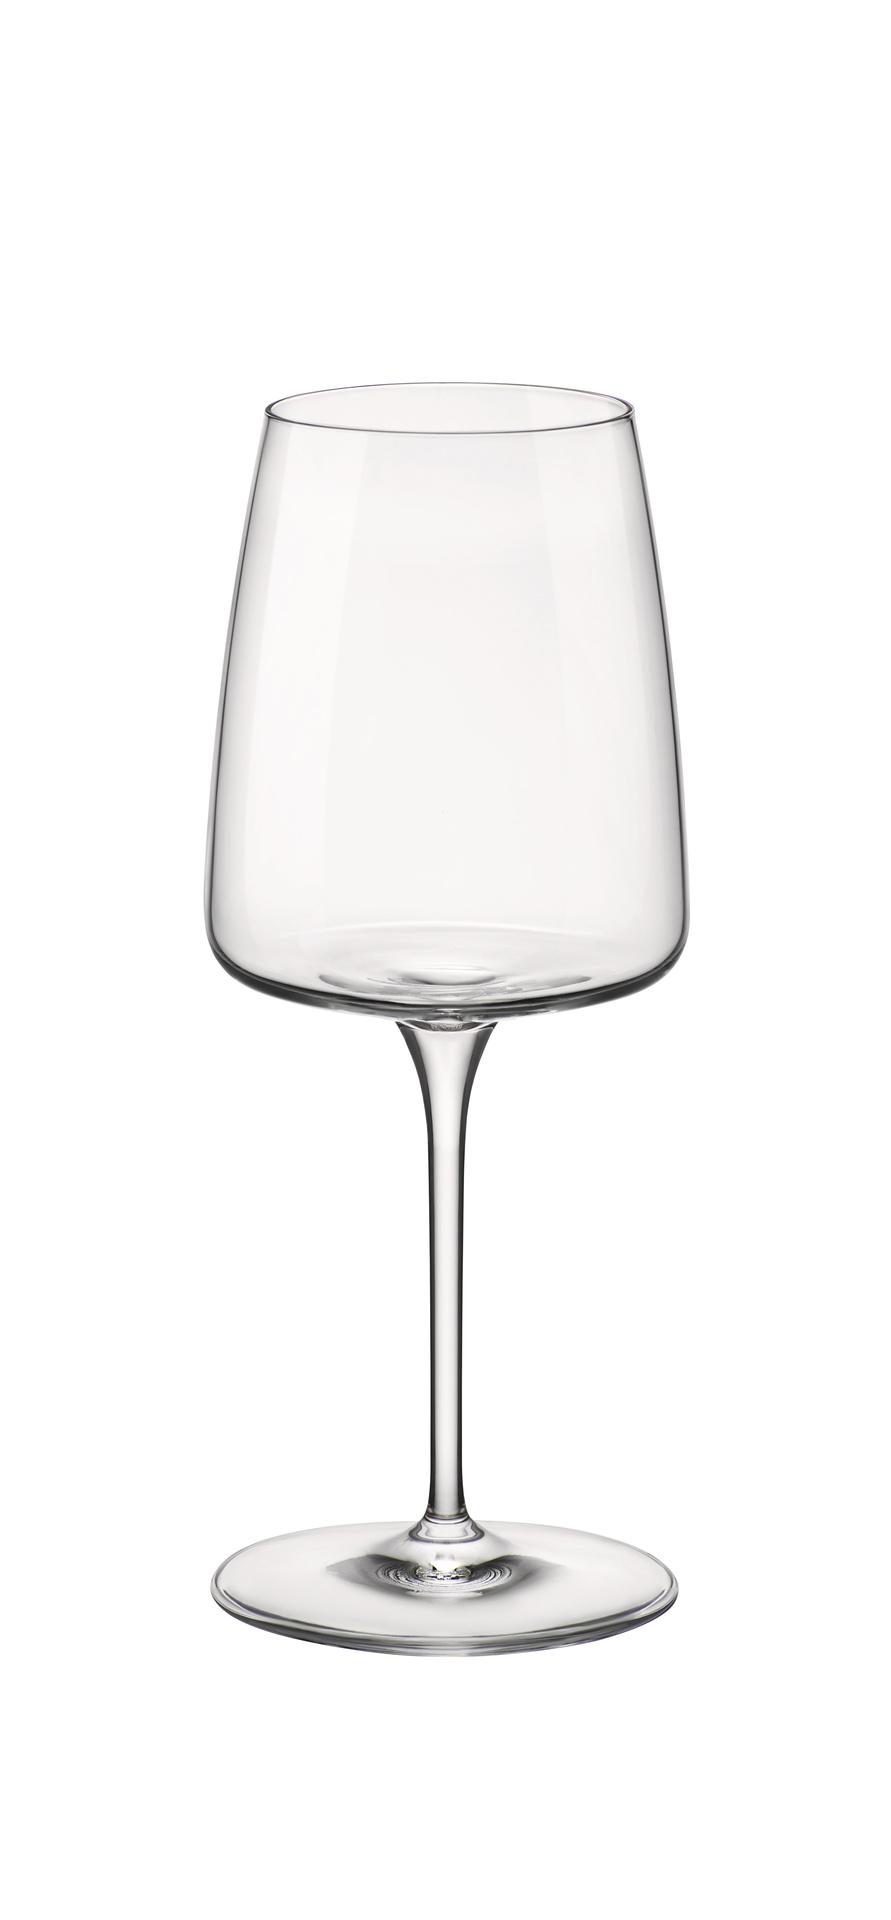 Набор из 6 бокалов для вина «Nexo», 450 мл набор бокалов для вина crystalite bohemia colibri 450 мл 6 предметов